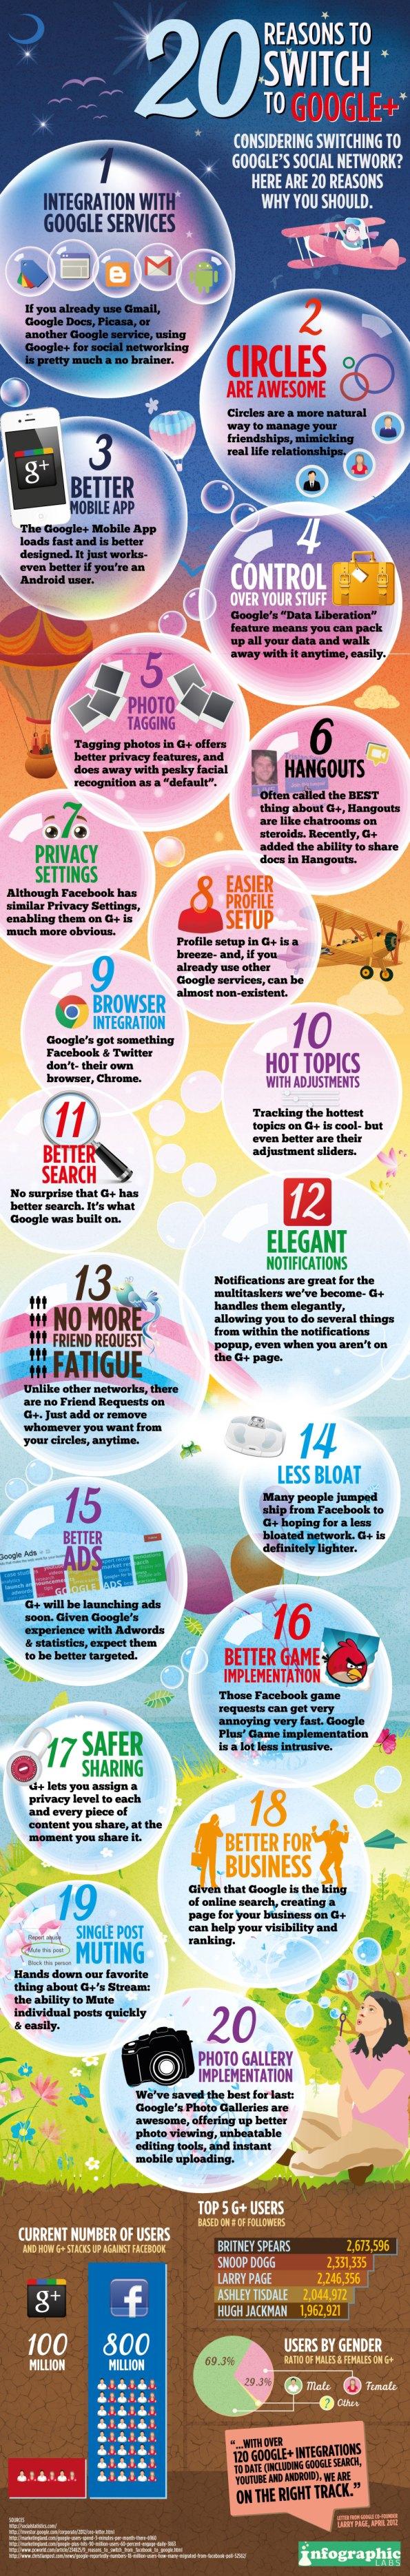 20 razones para cambiar a Google + [Infografía]